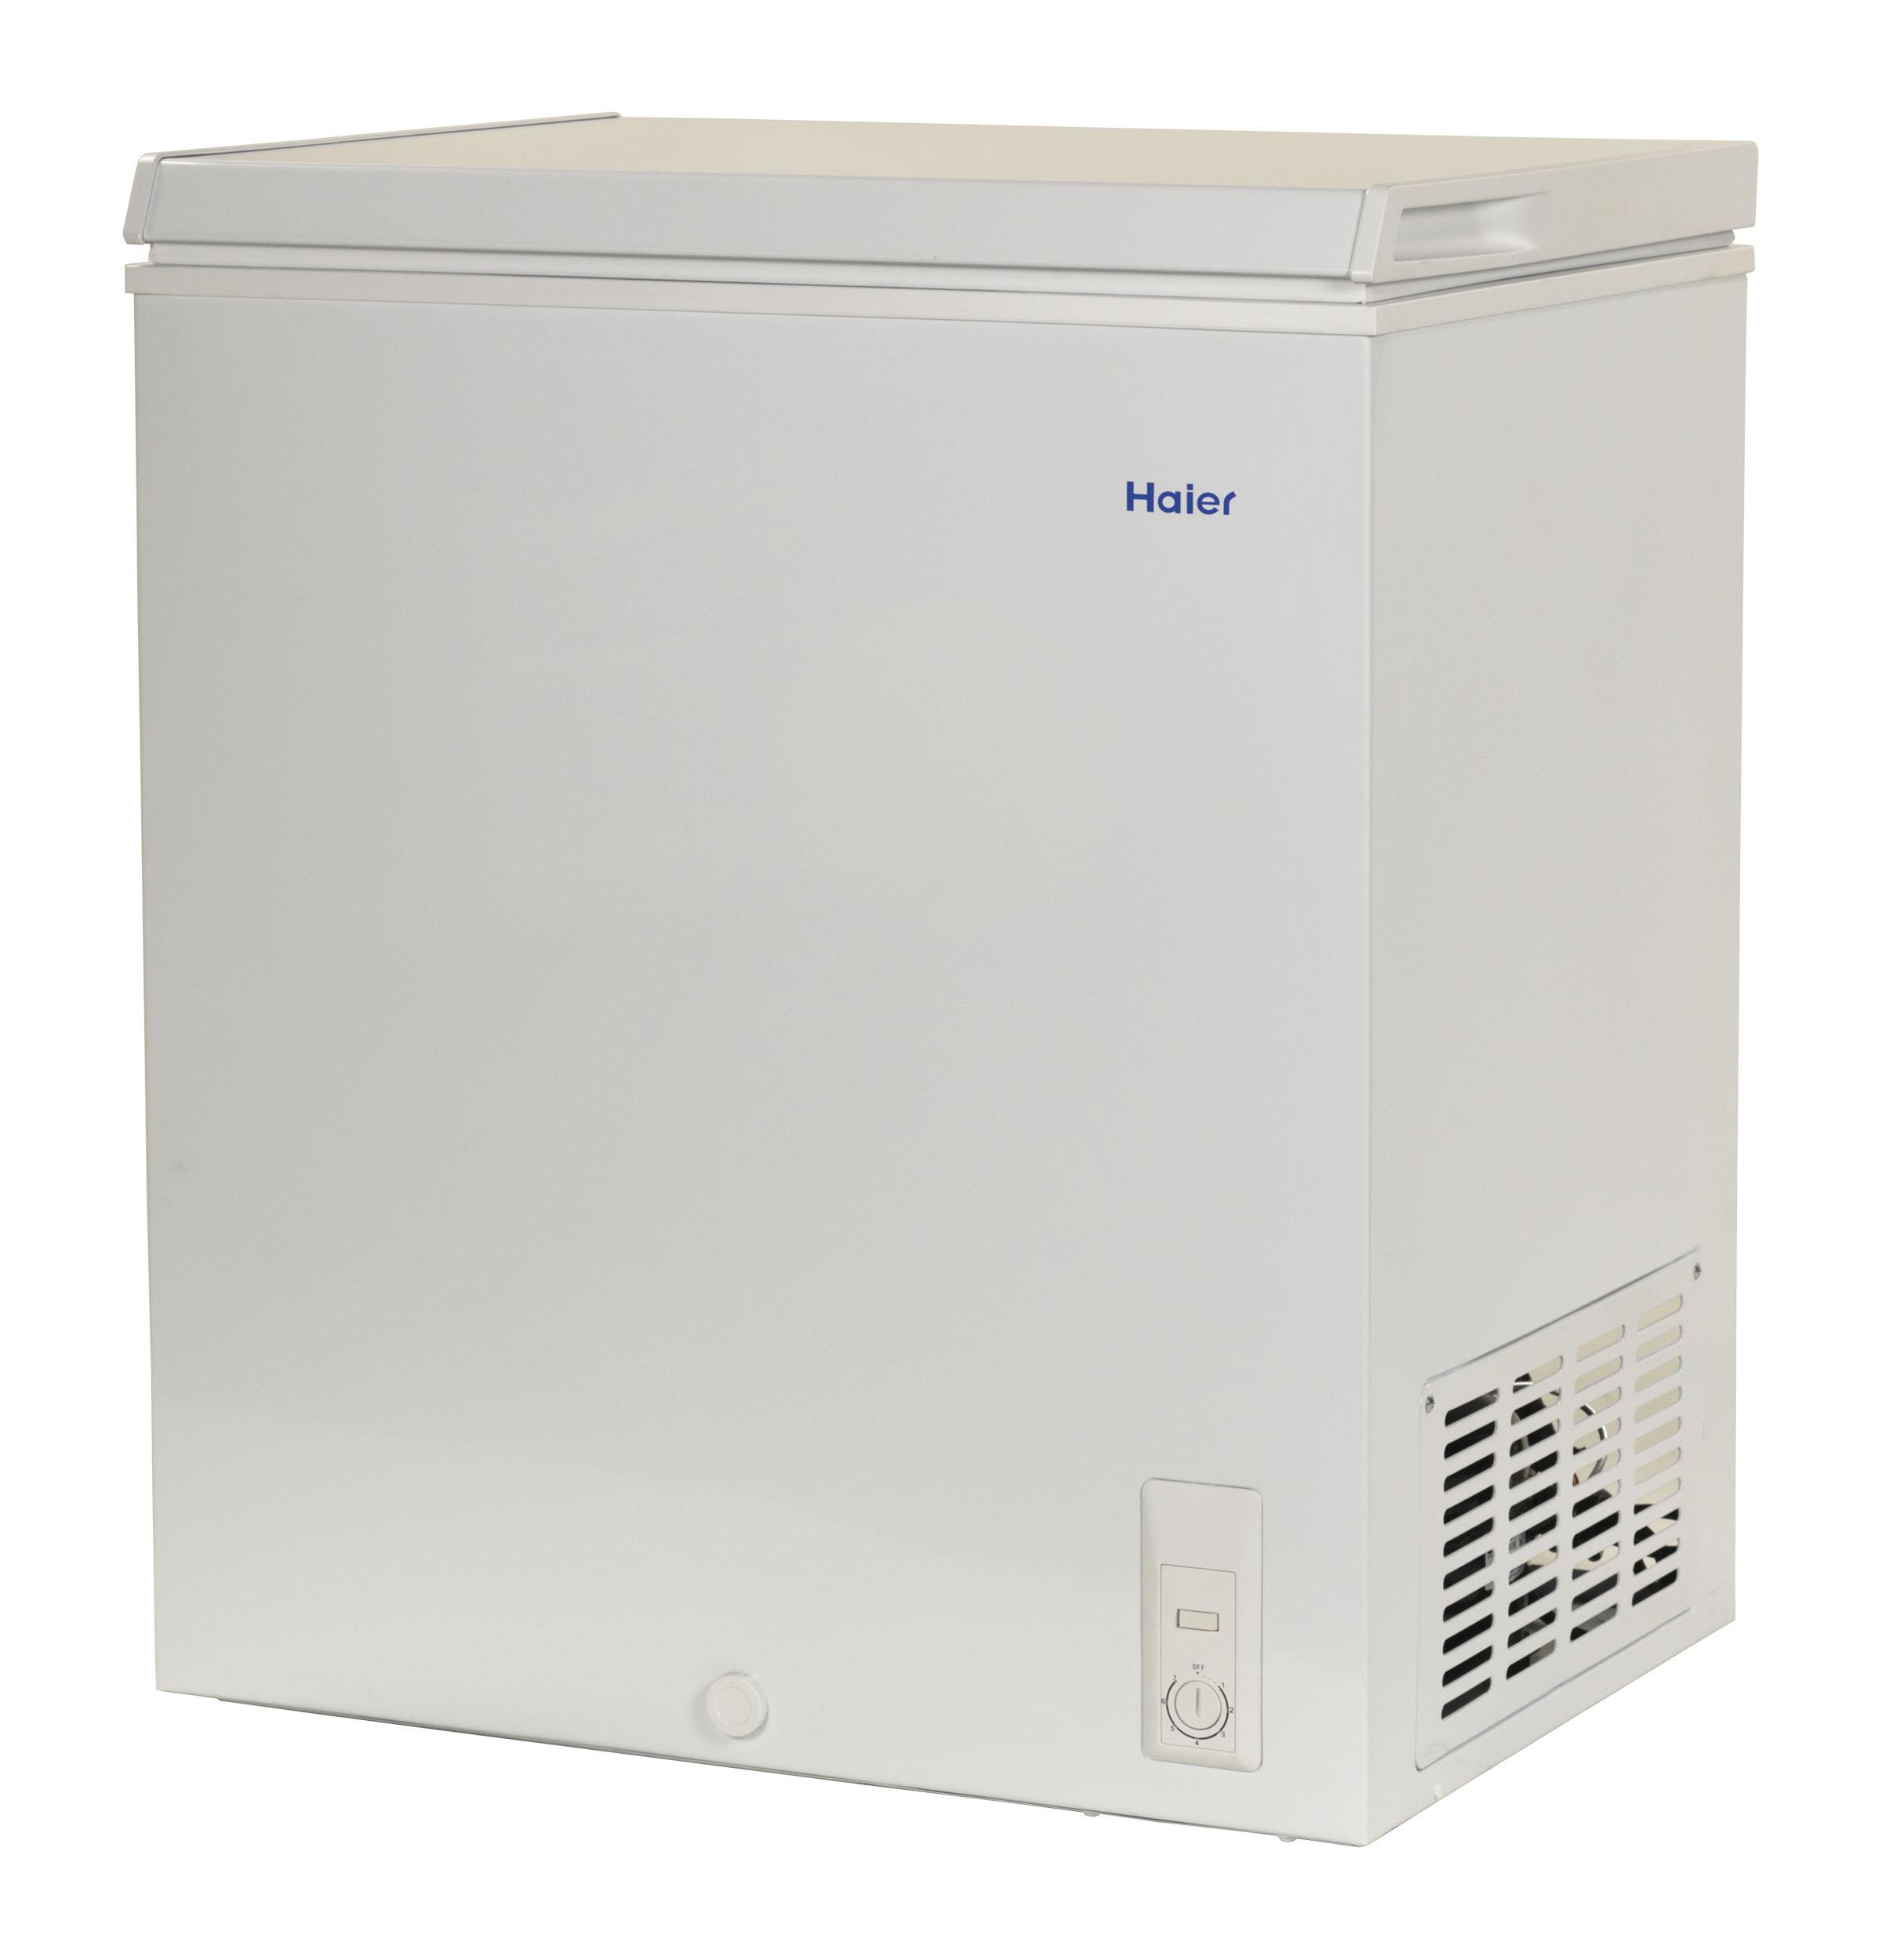 Model: HF50CW20W   Haier 5.0 Cu. Ft. Capacity Chest Freezer